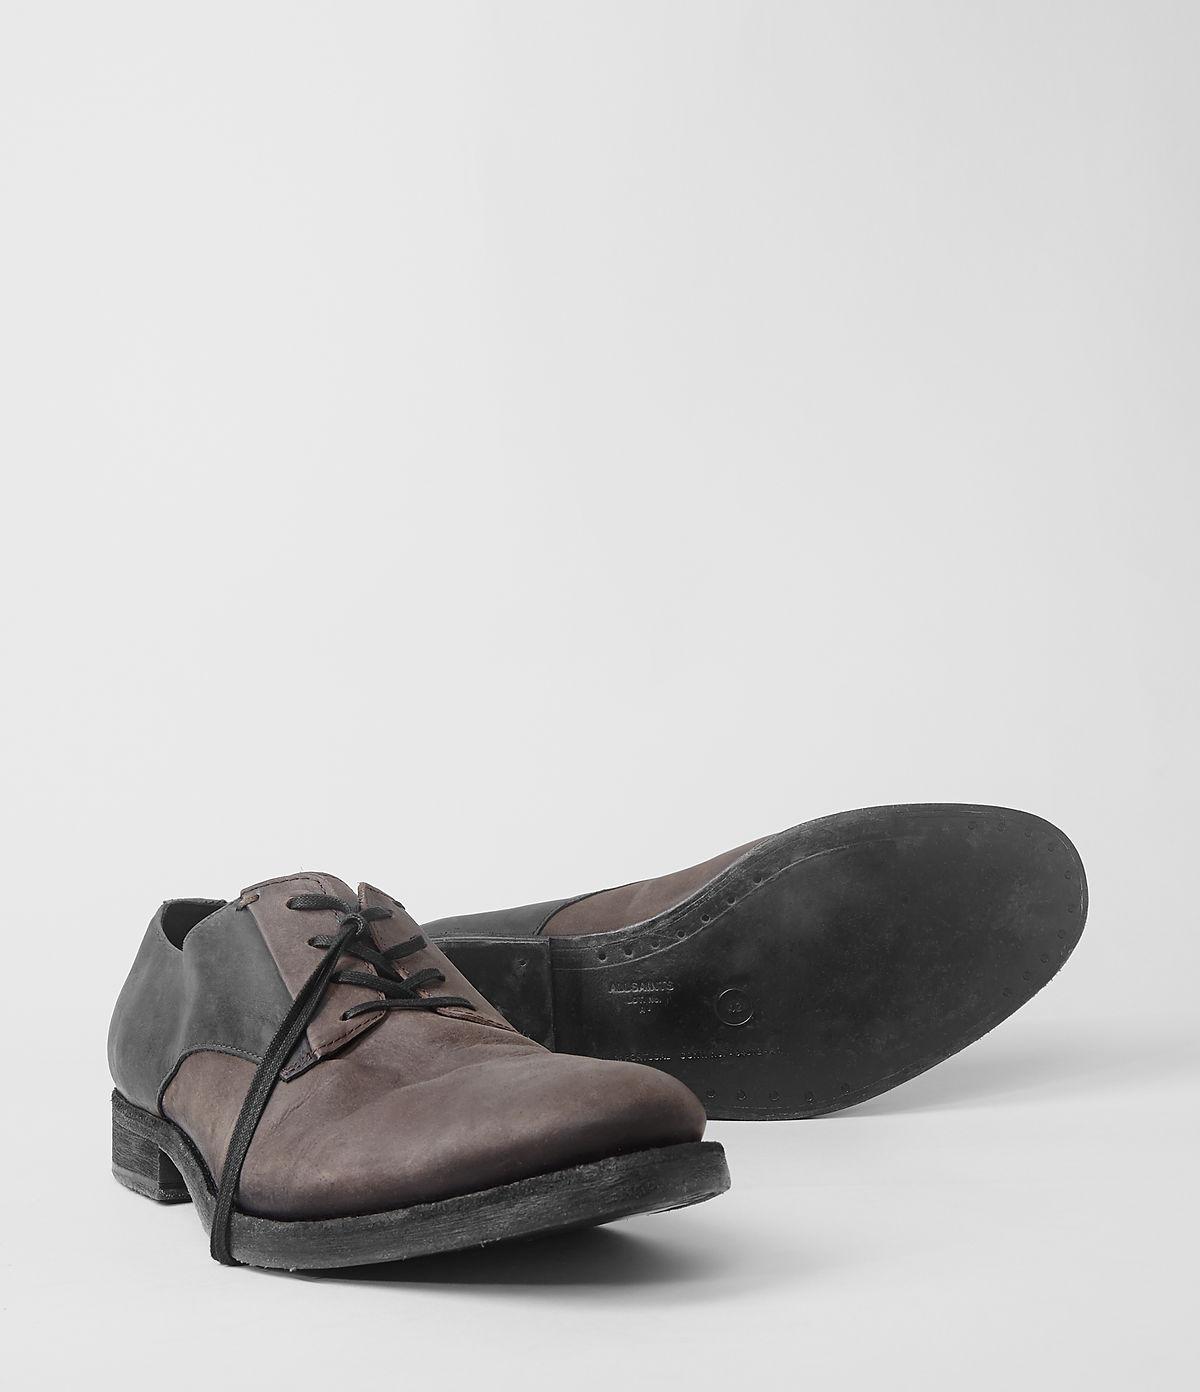 AllSaints Guard Shoe in Brown for Men